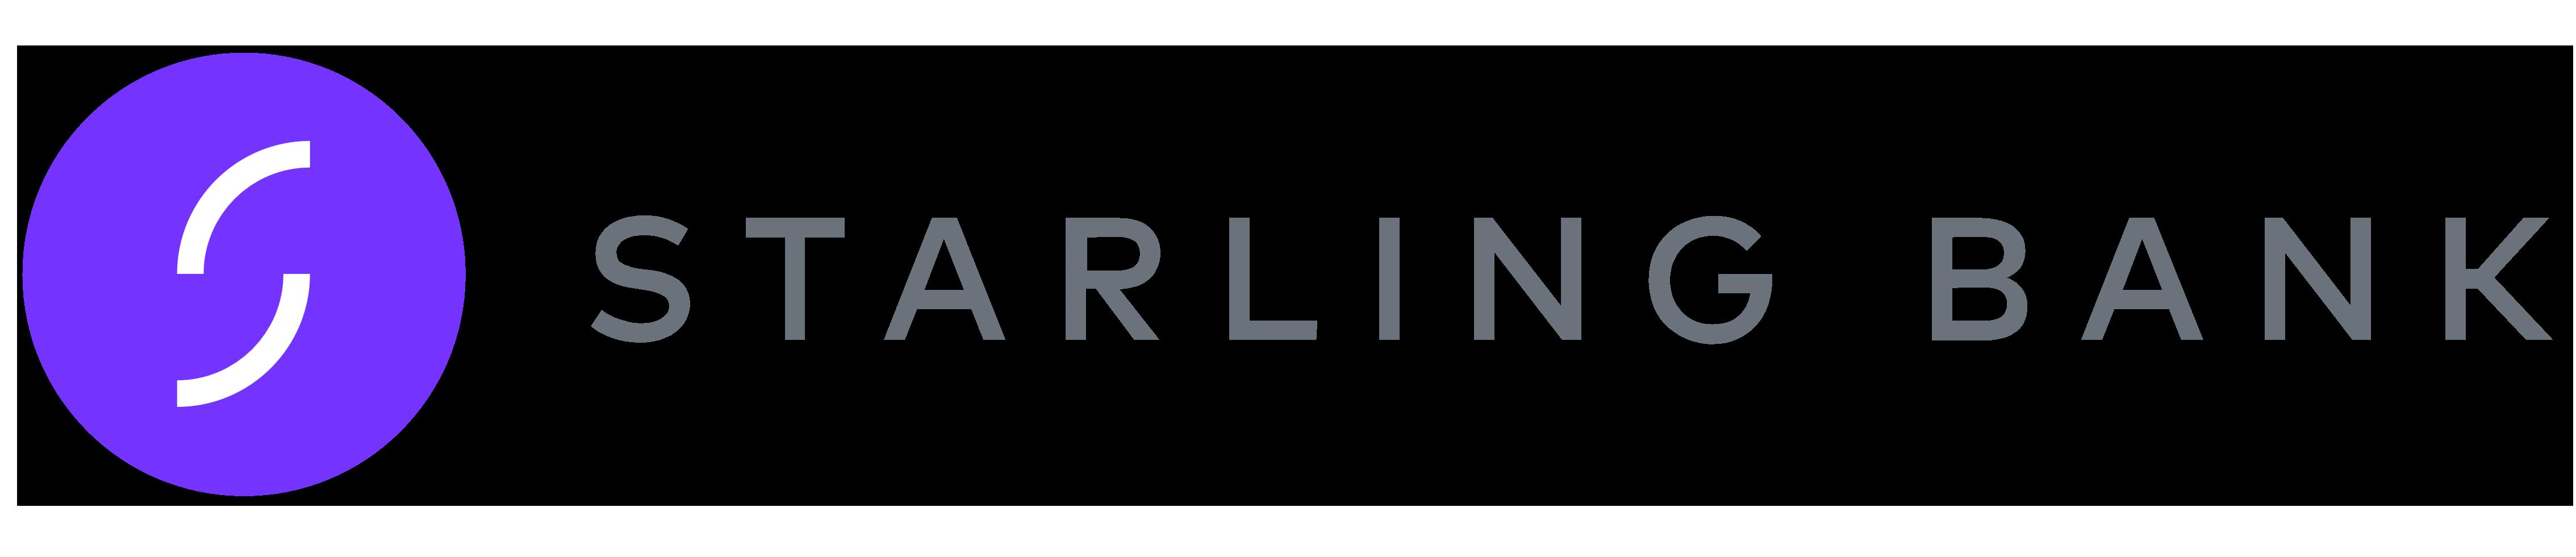 Starling Bank – Logos Download